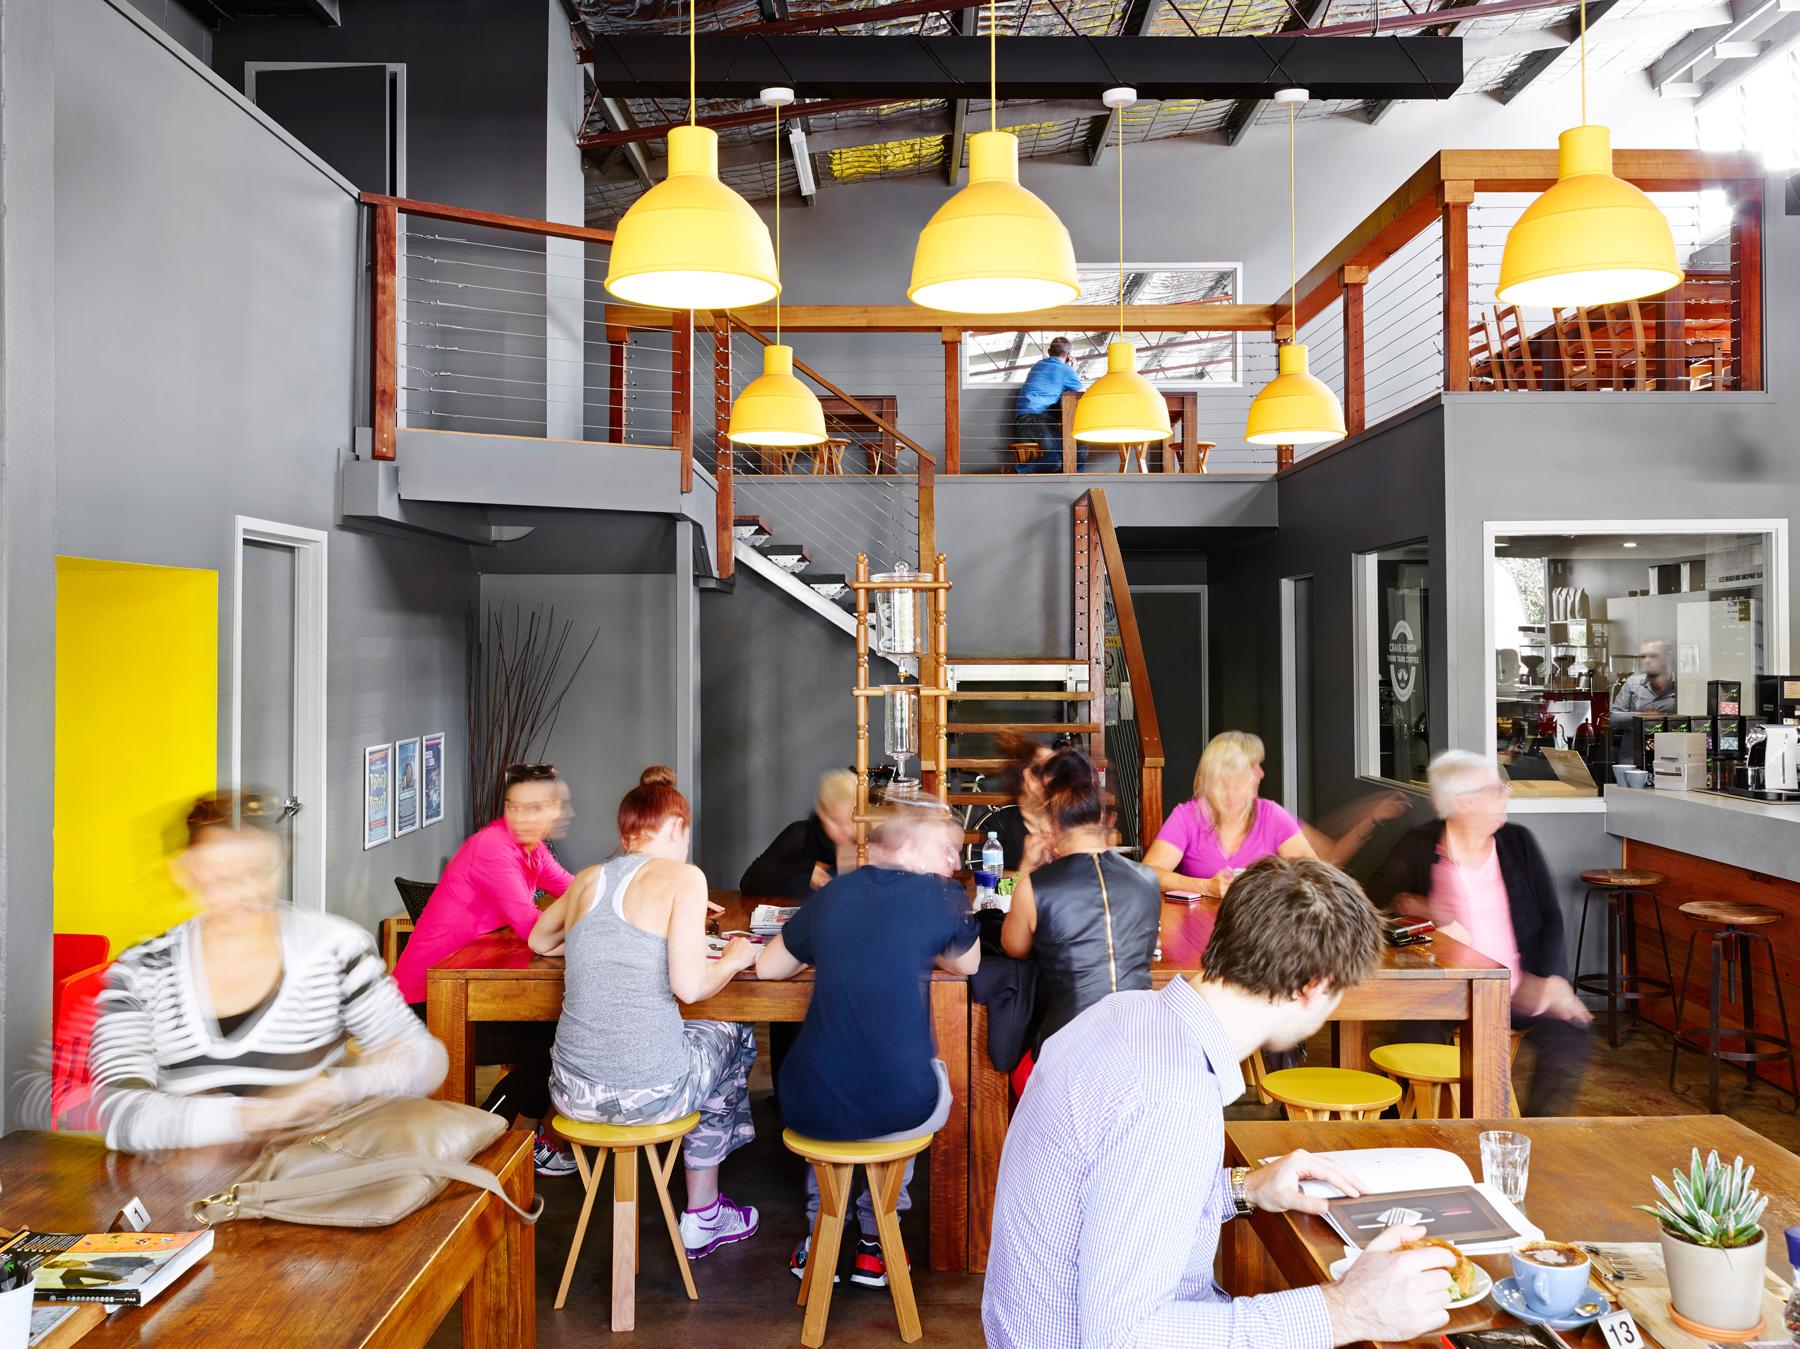 Sydney's second CBD: A closer look at Parramatta's office market